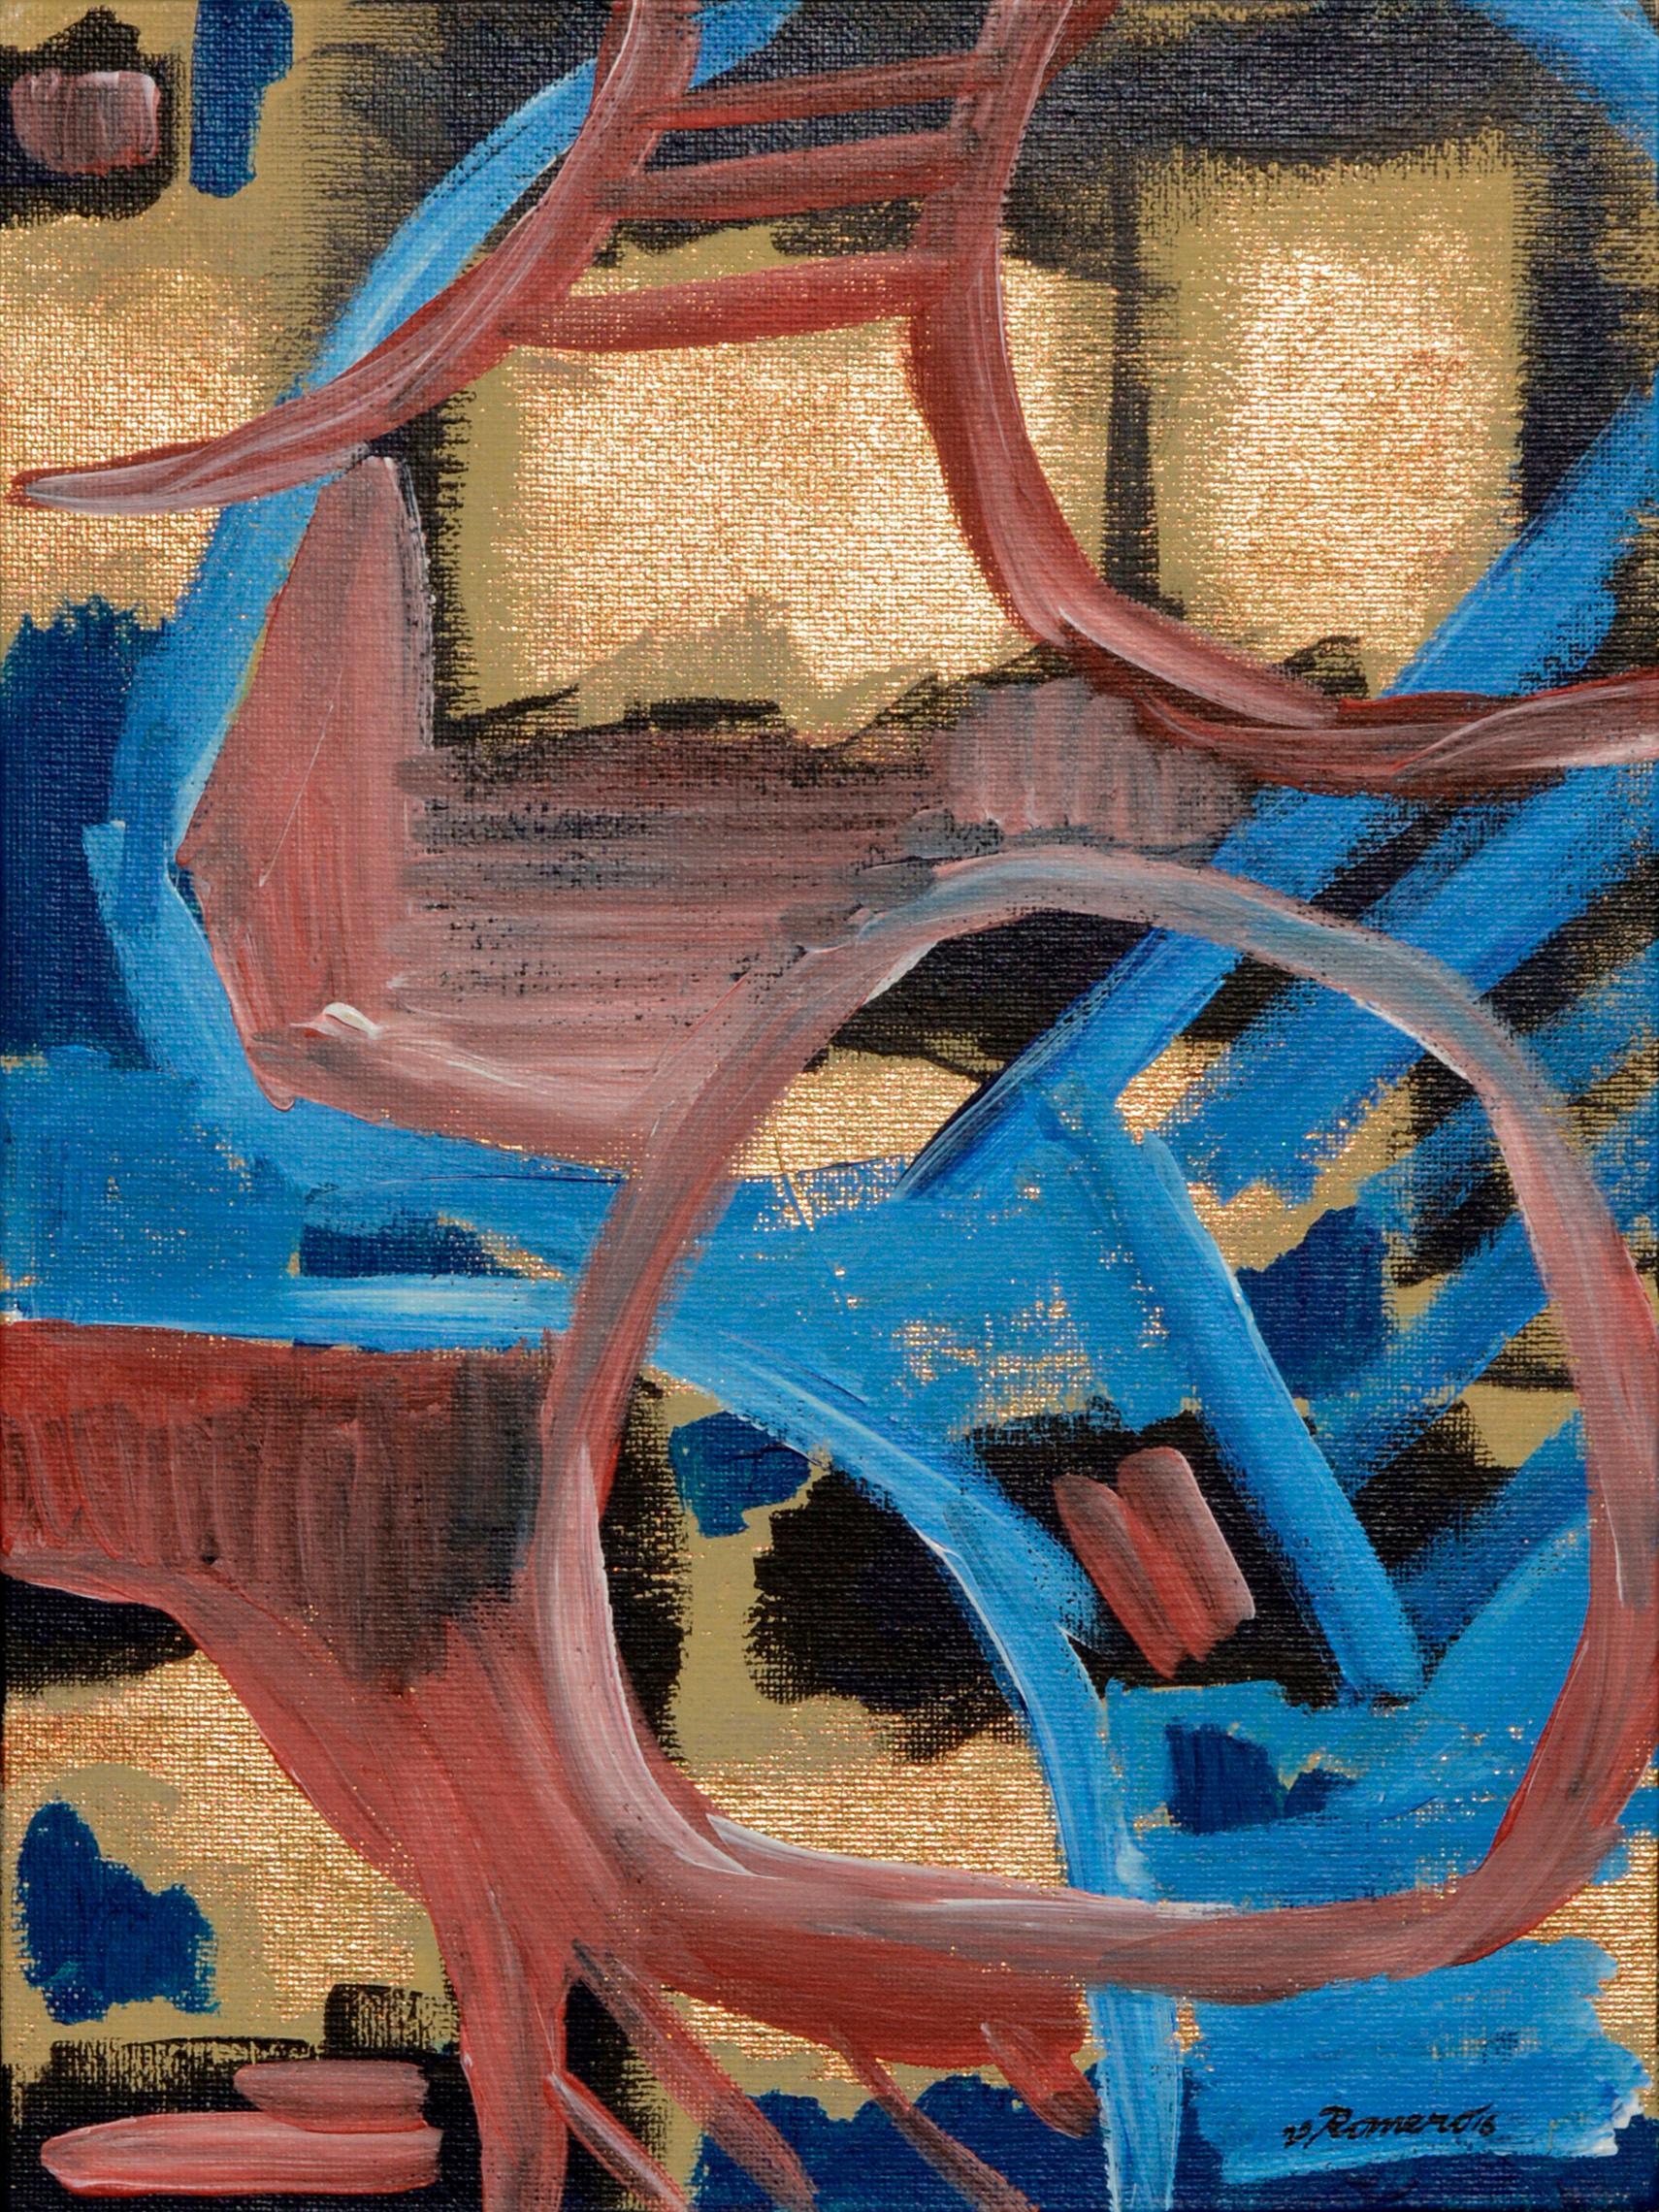 """Puzzled"" by Aromas Artist Frank Thomas Romero"